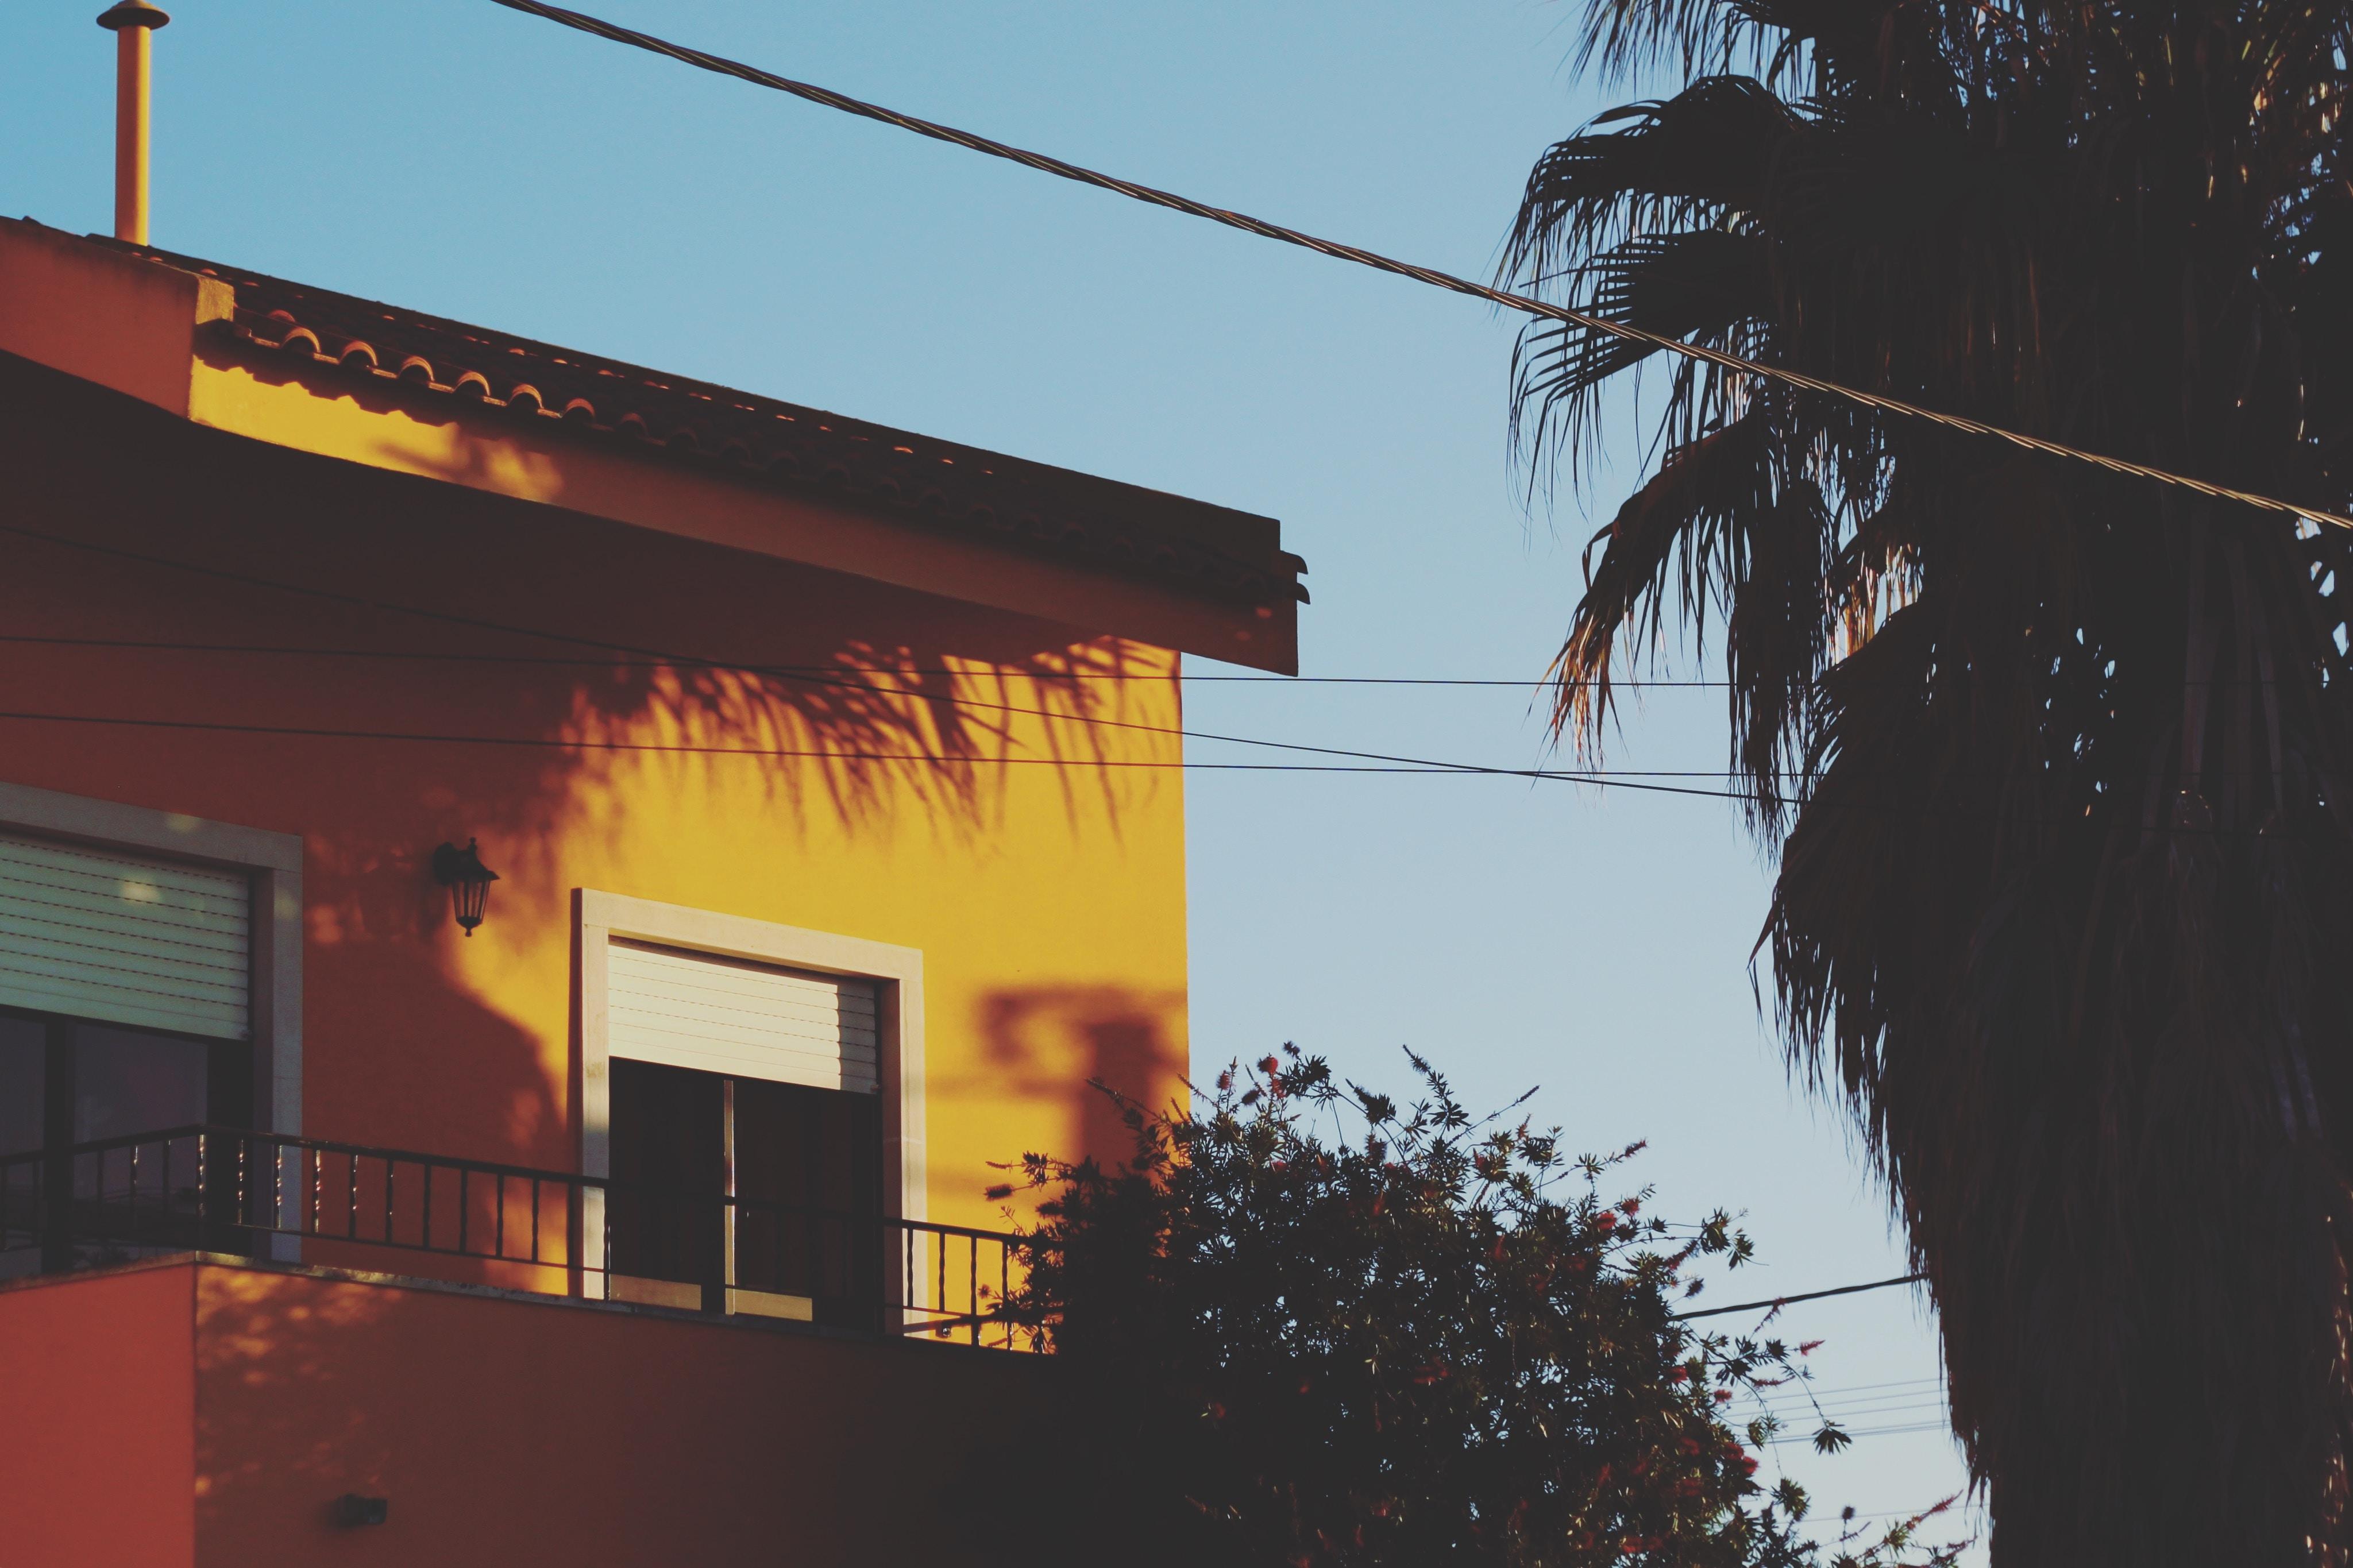 yellow concrete house beside tree